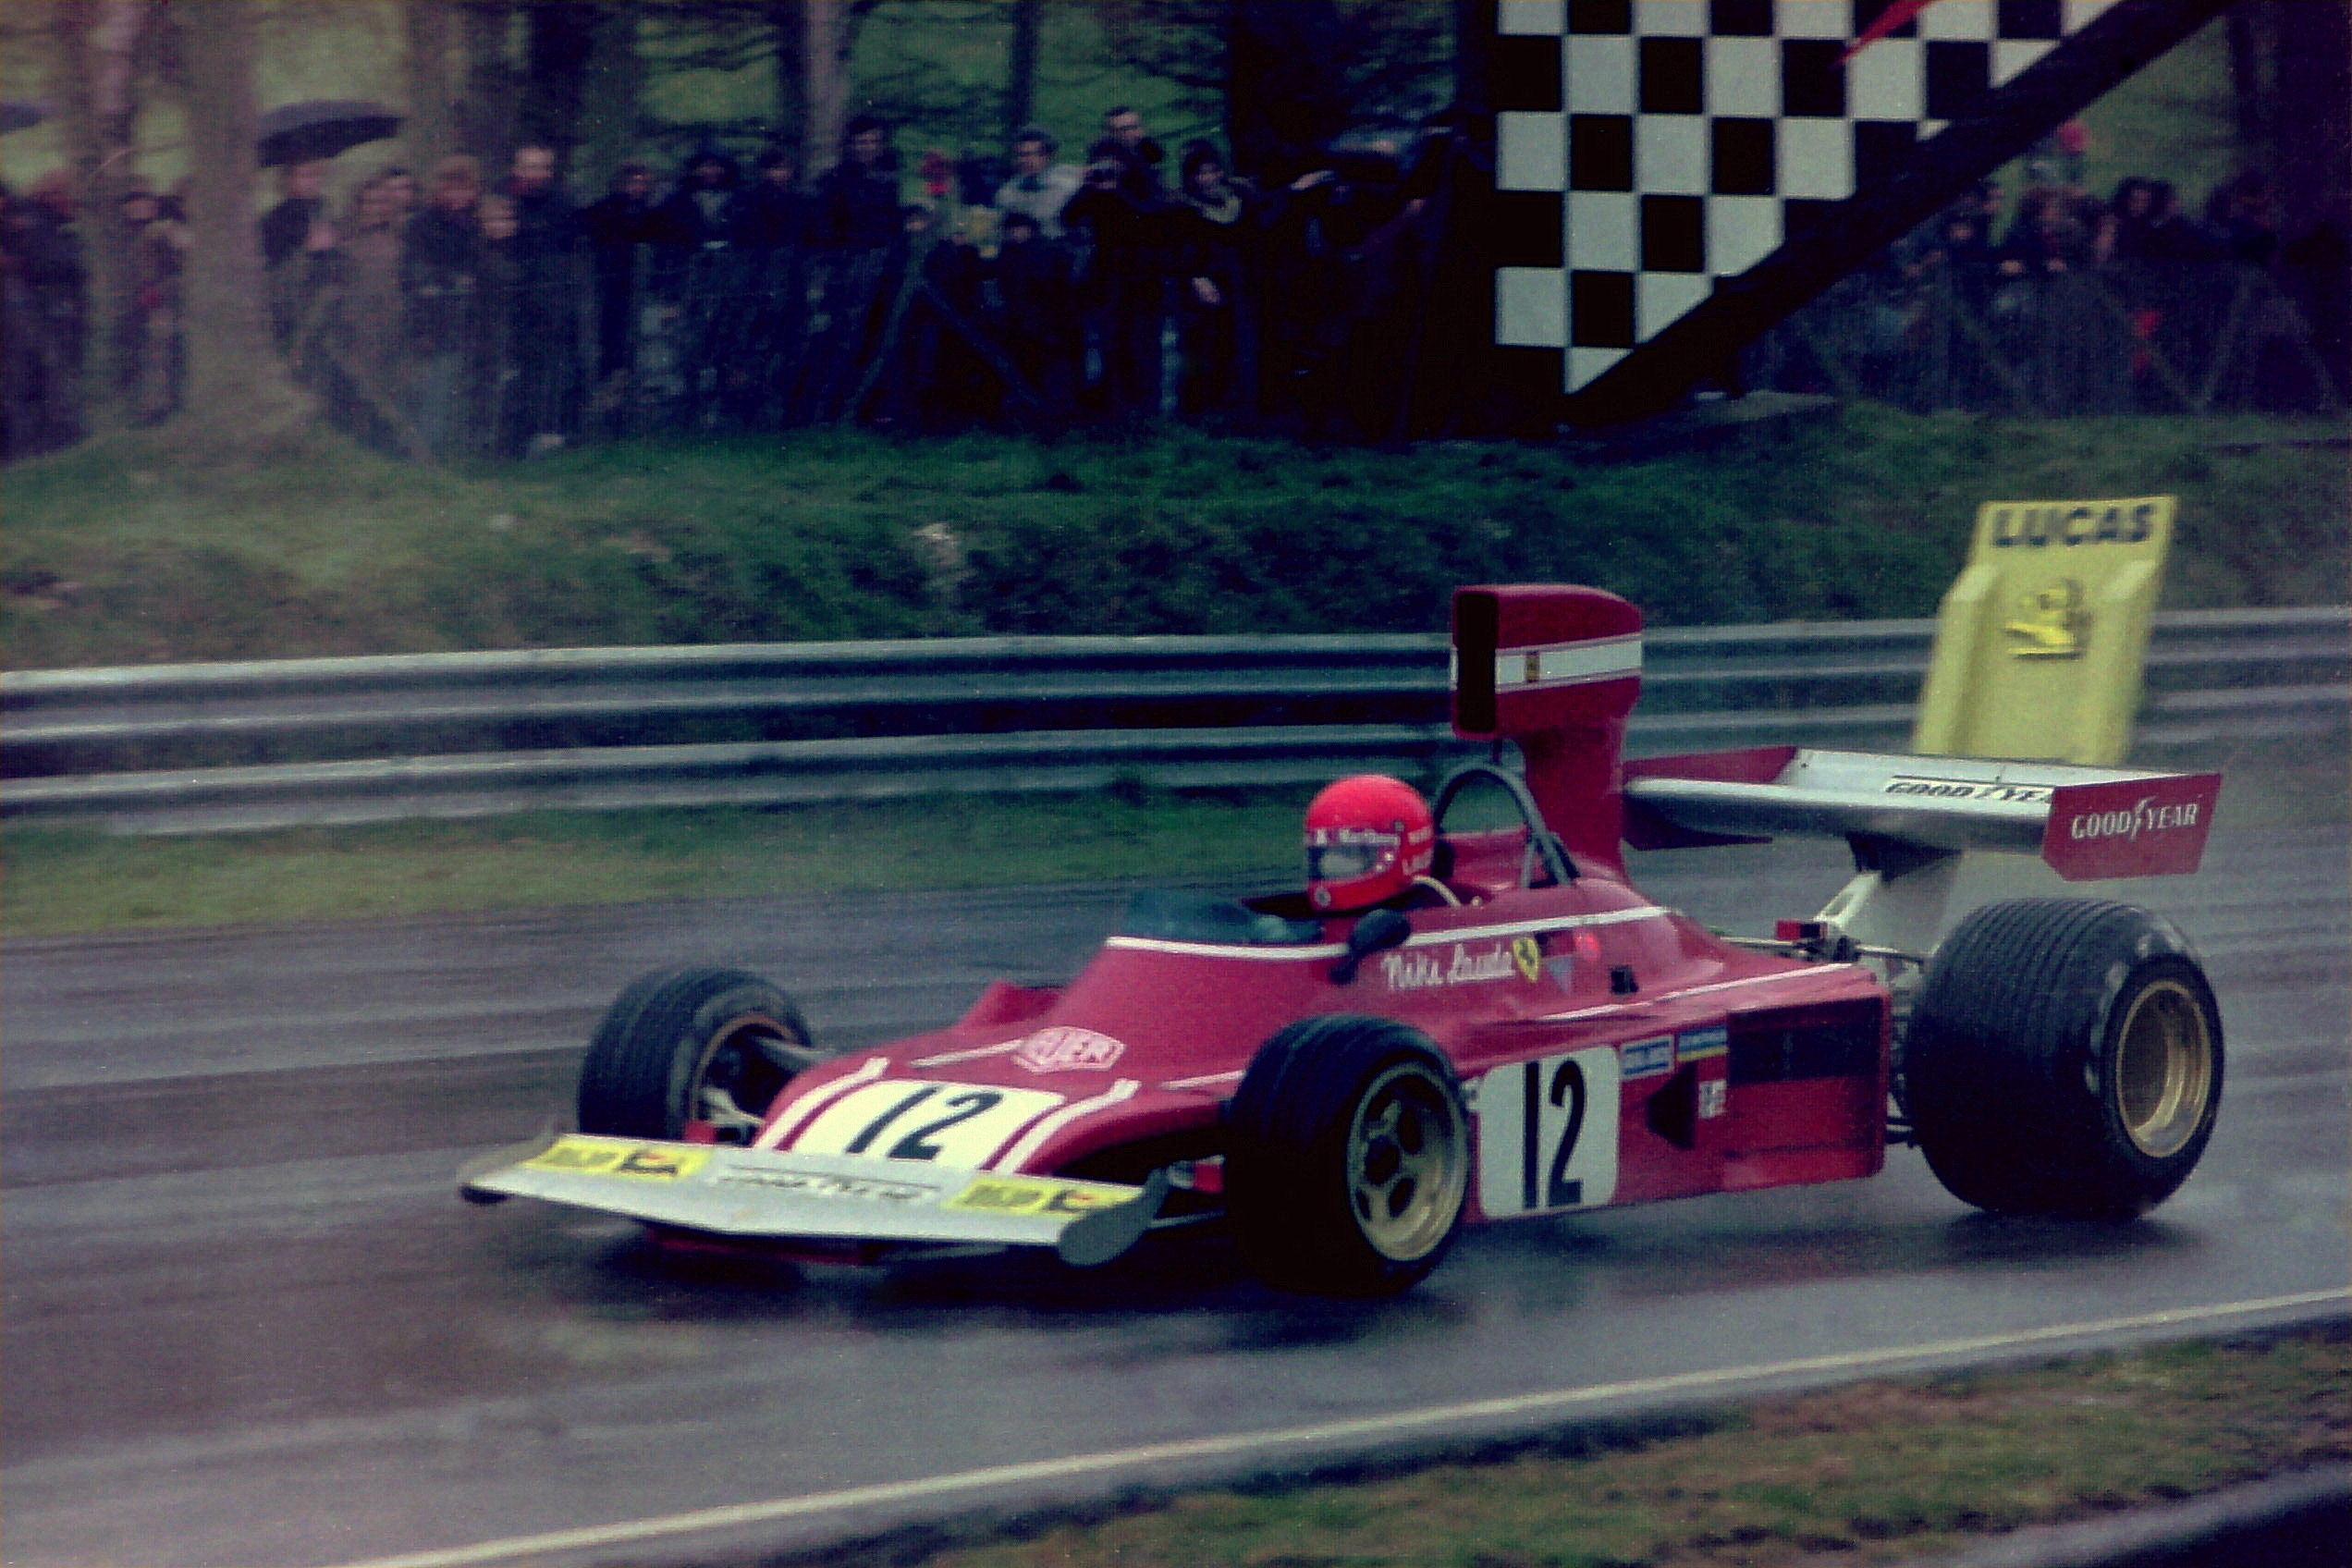 Niki_Lauda_1974_Race_of_Champions_2.jpg